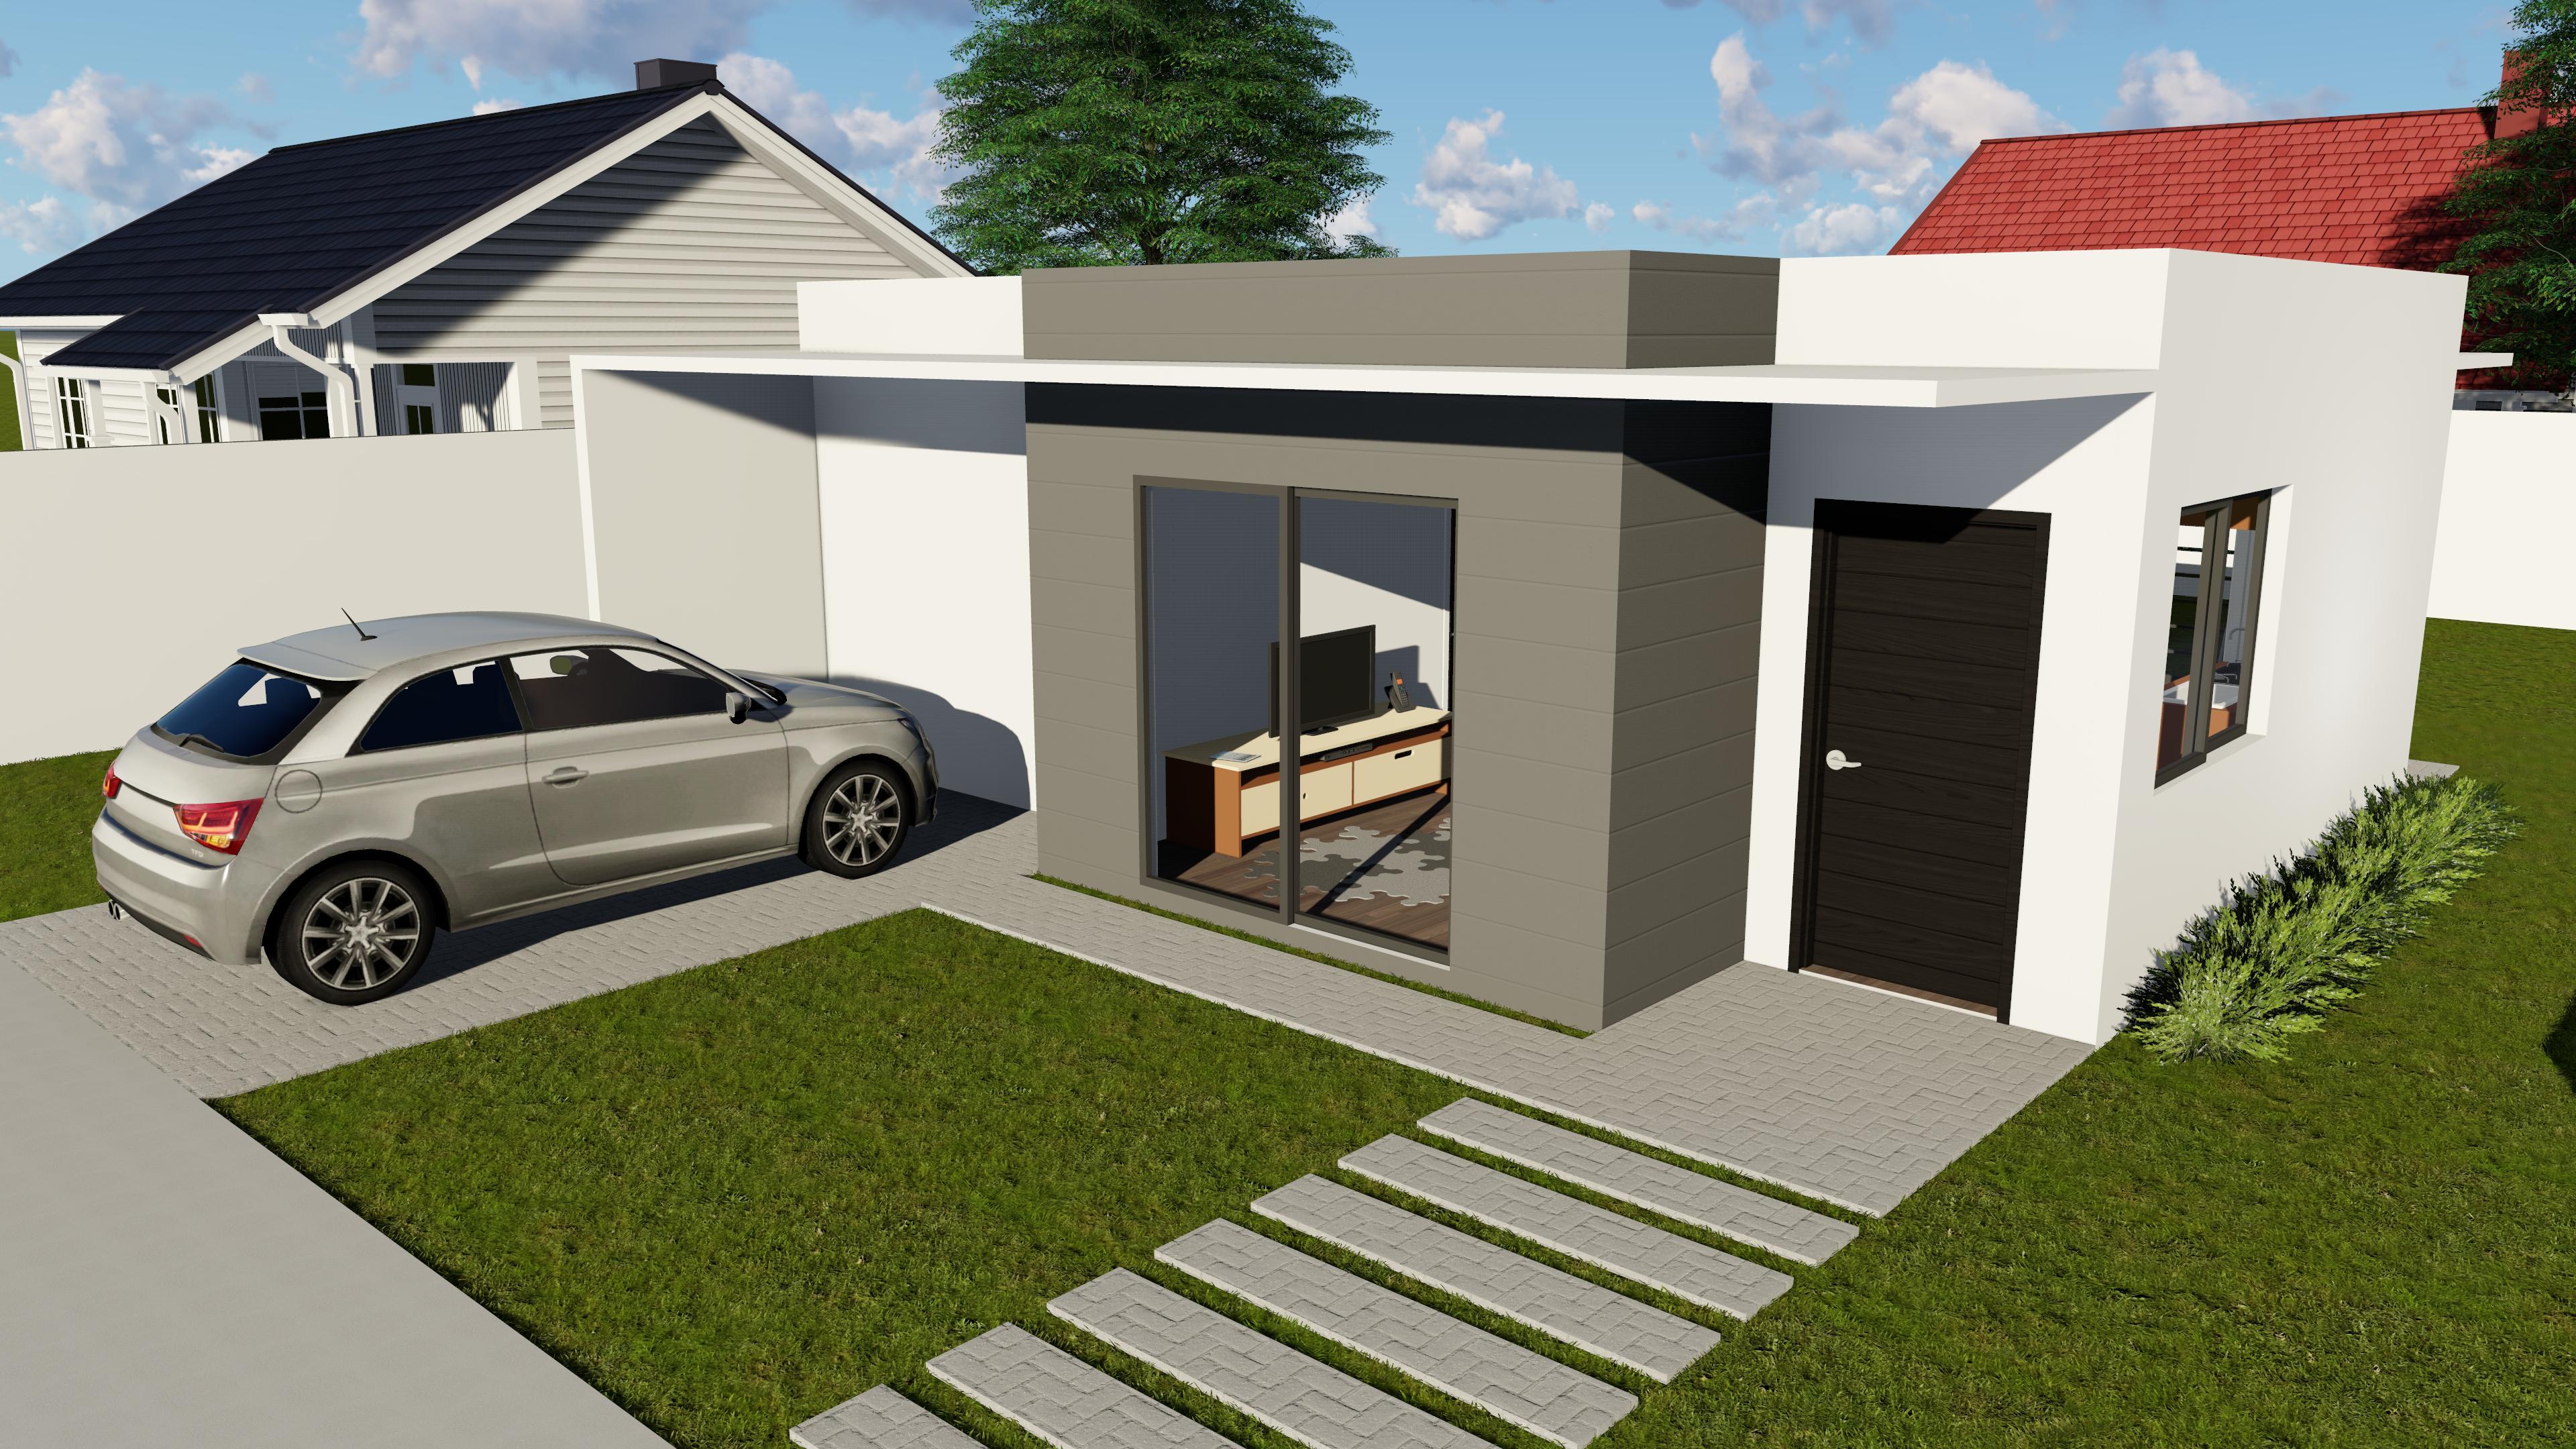 Casas steel frame modelos prontos sulm dulos sistemas for Modelo de fachadas de viviendas